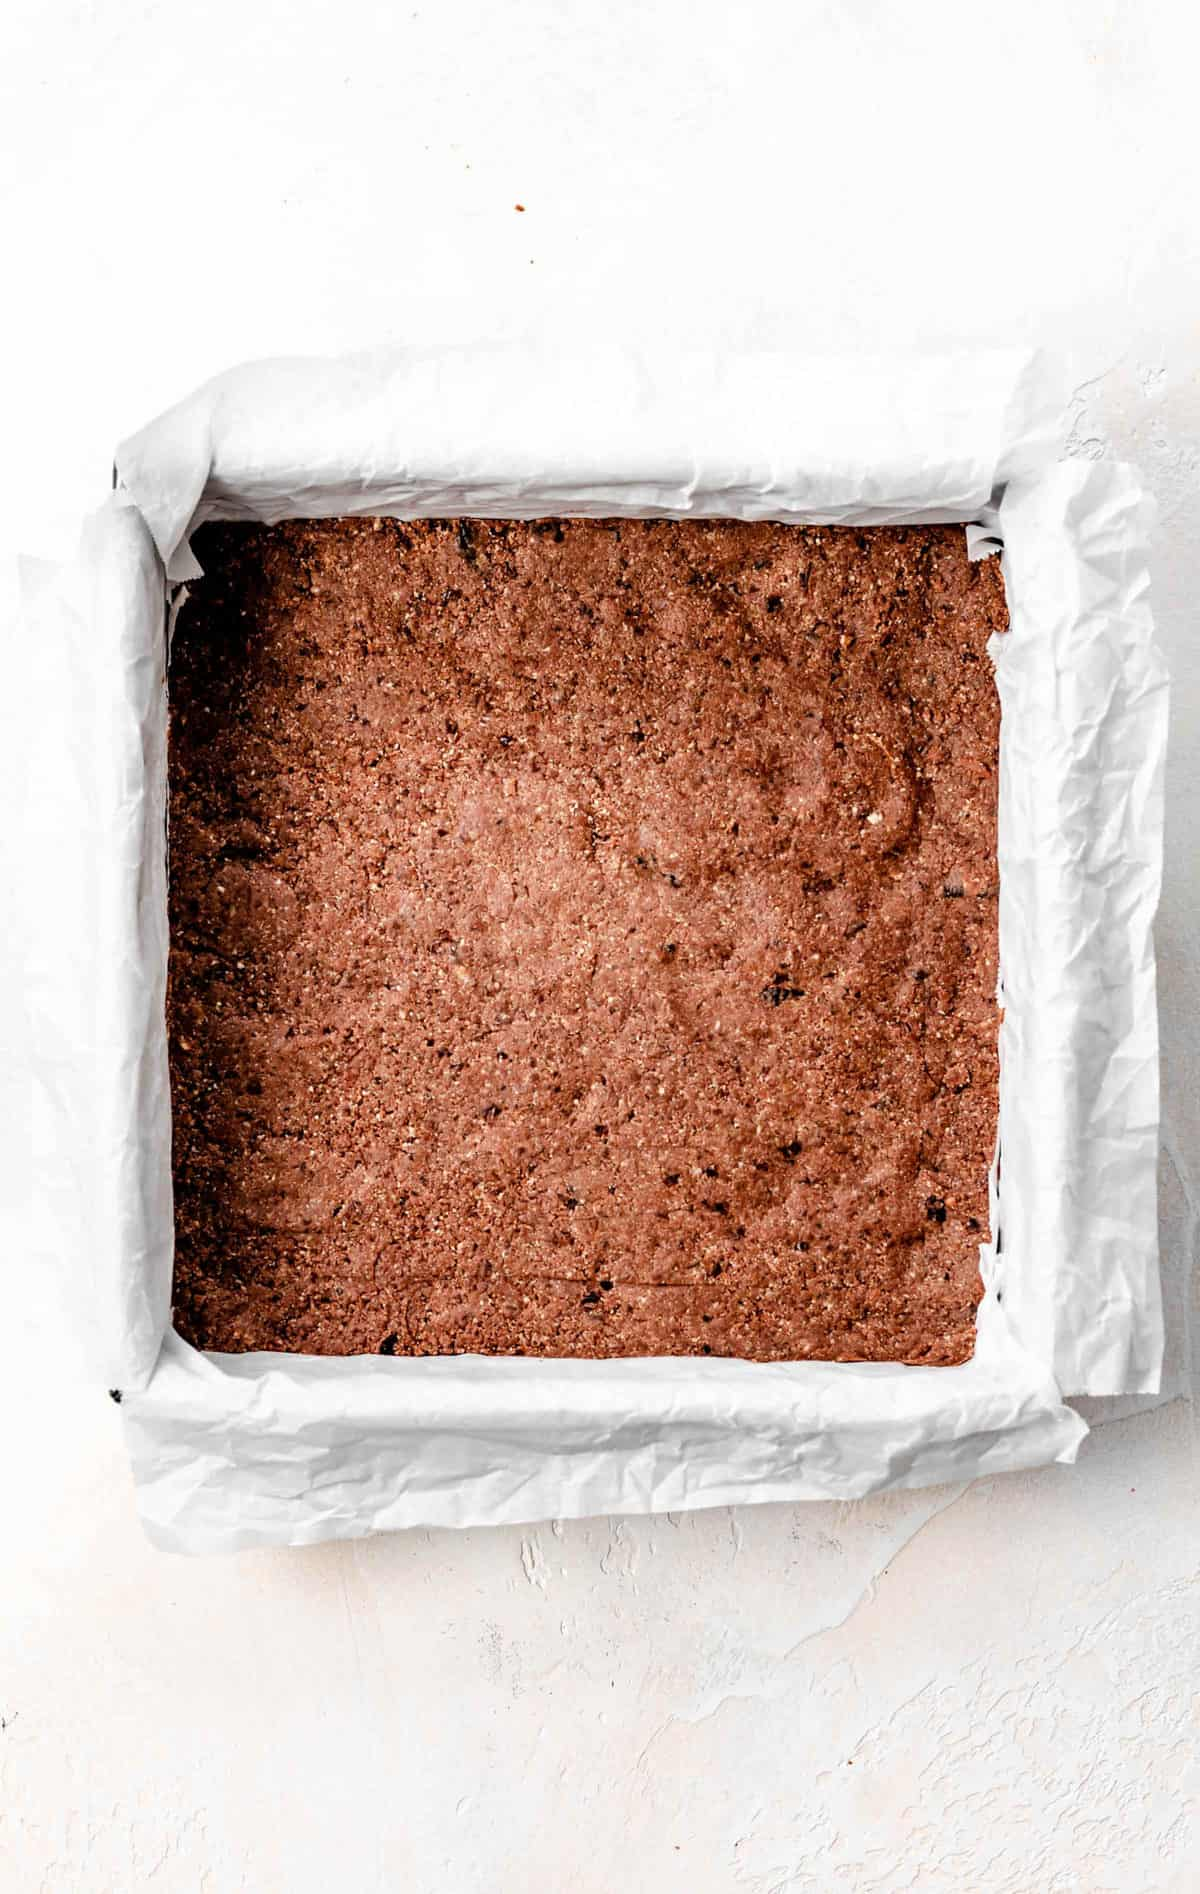 tahini bar crust in baking pan